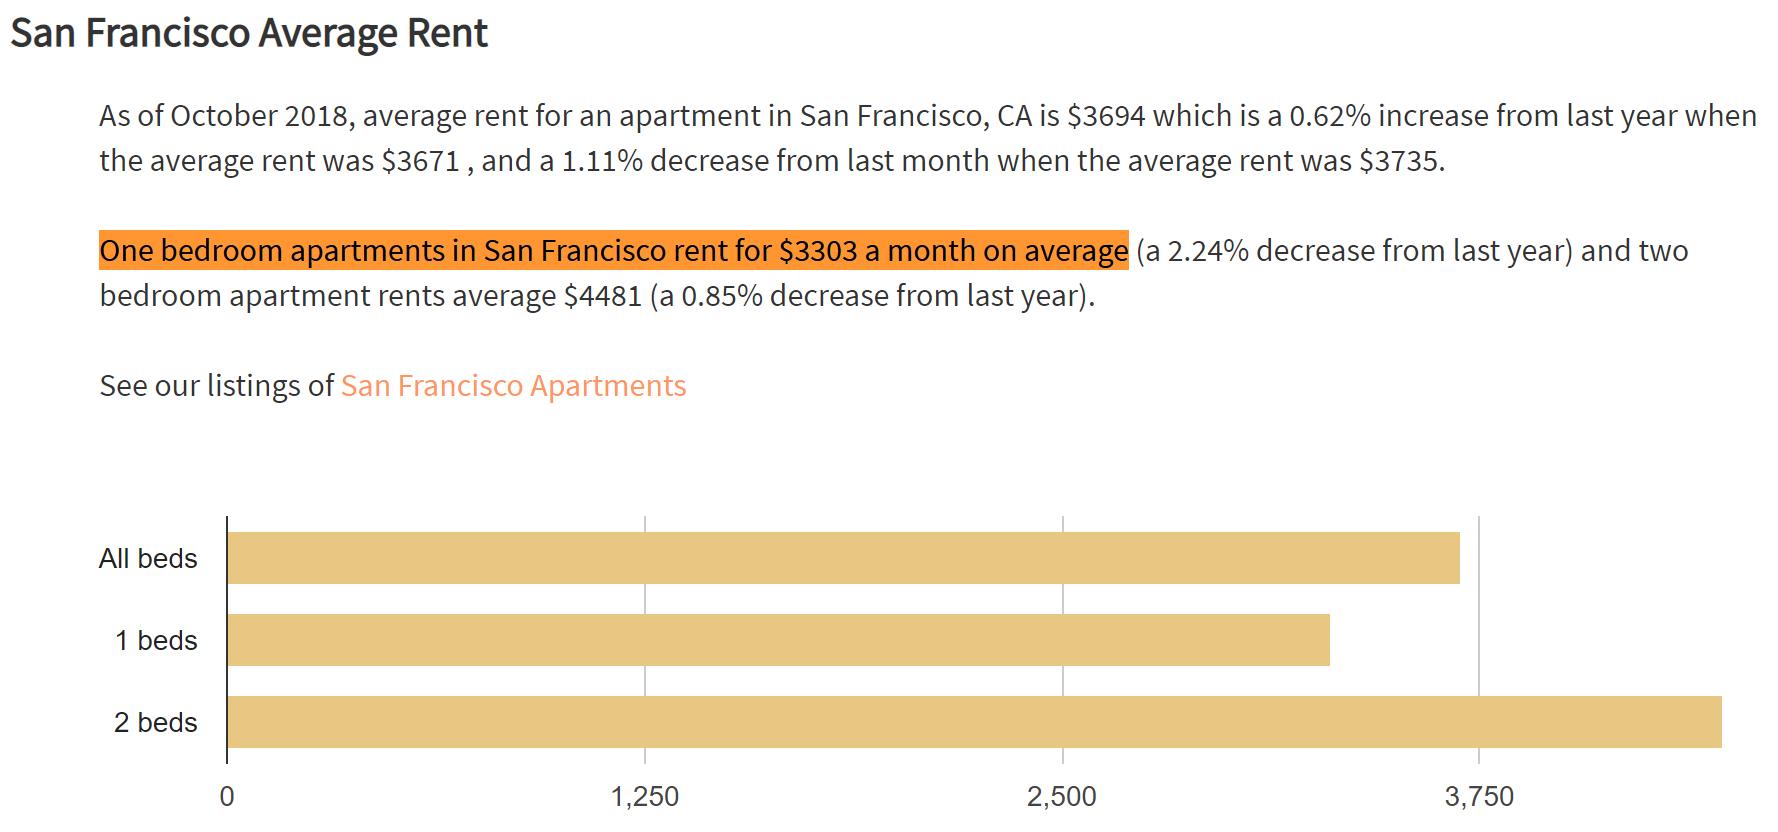 image via https://www.rentjungle.com/average-rent-in-san-francisco-rent-trends/